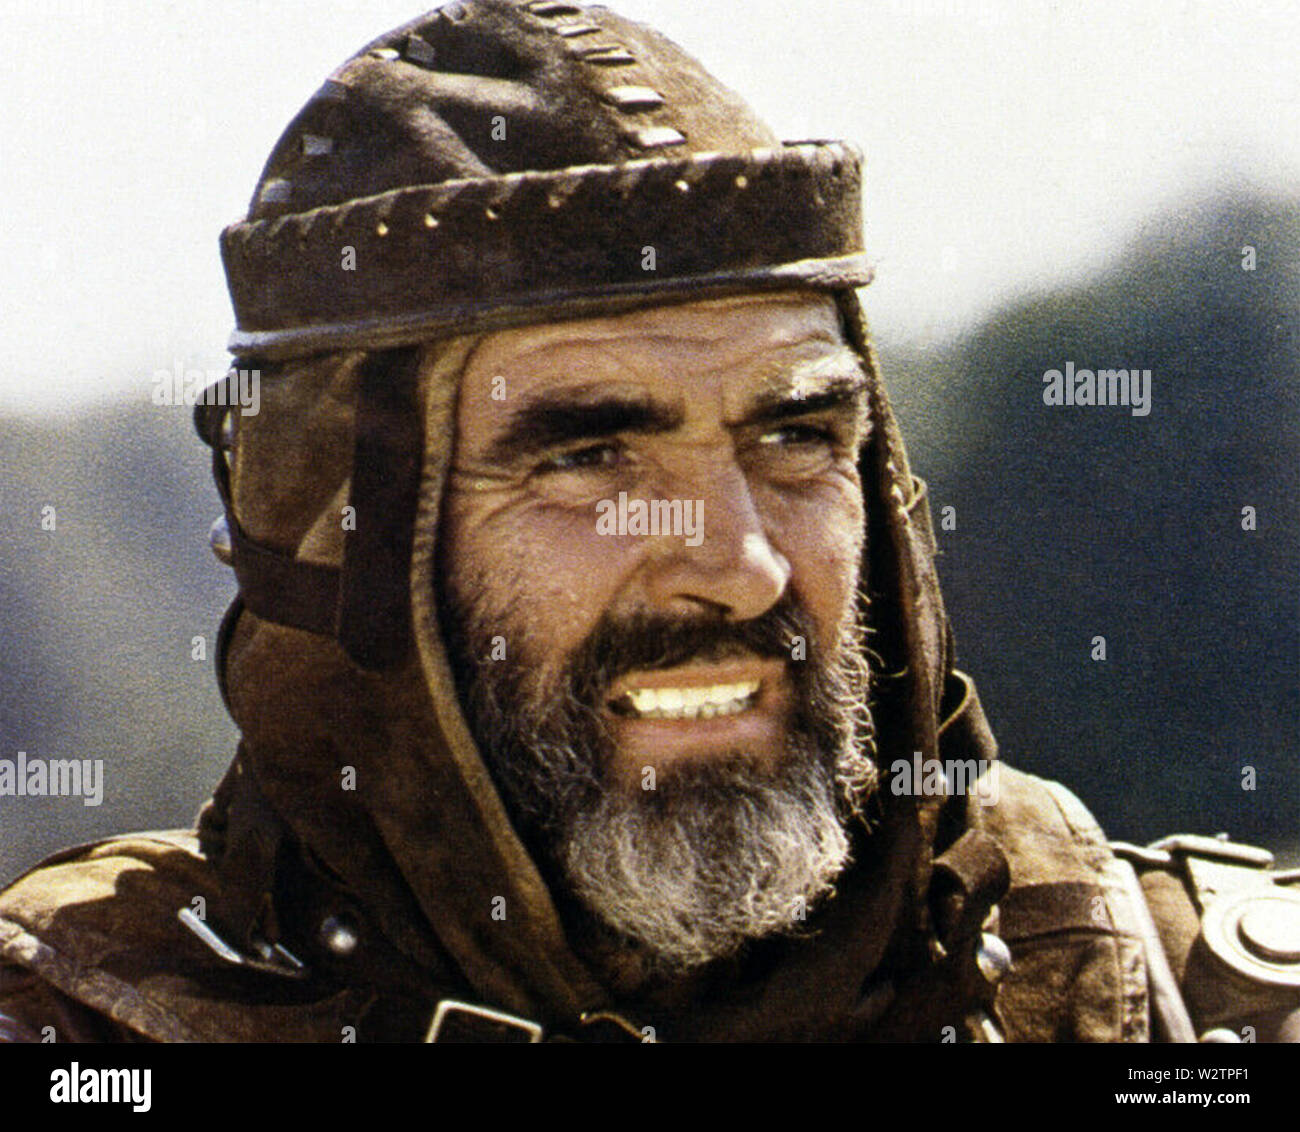 ROBIN UND MARIAN 1976 Columbia Pictures Film mit Sean Connery als Robin Hood Stockfoto